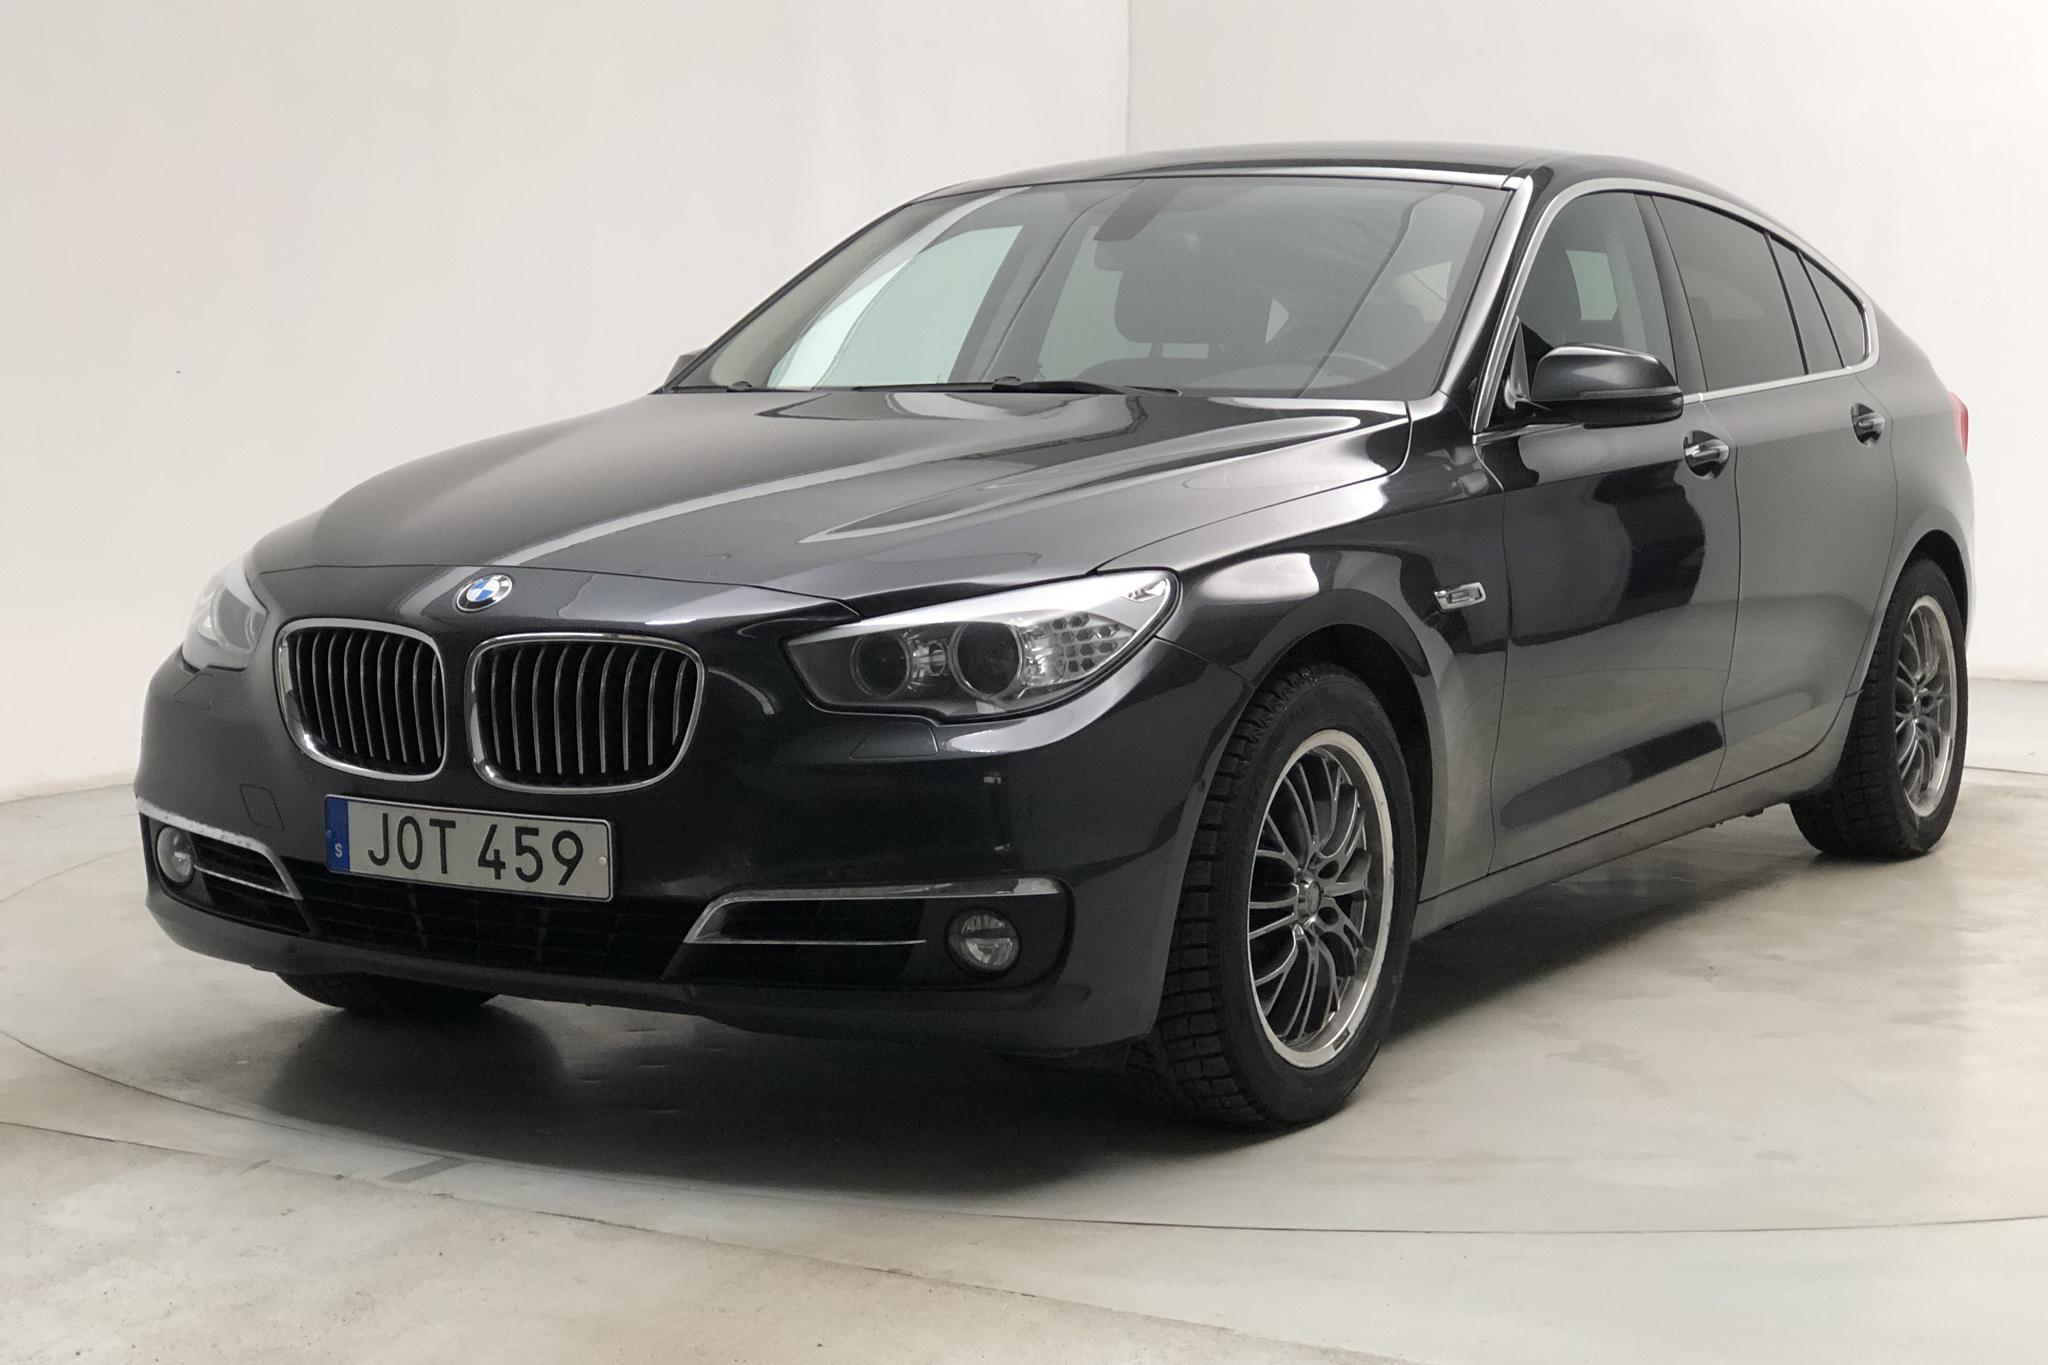 BMW 520d GT, F07 (184hk) - 115 150 km - Automatic - gray - 2015